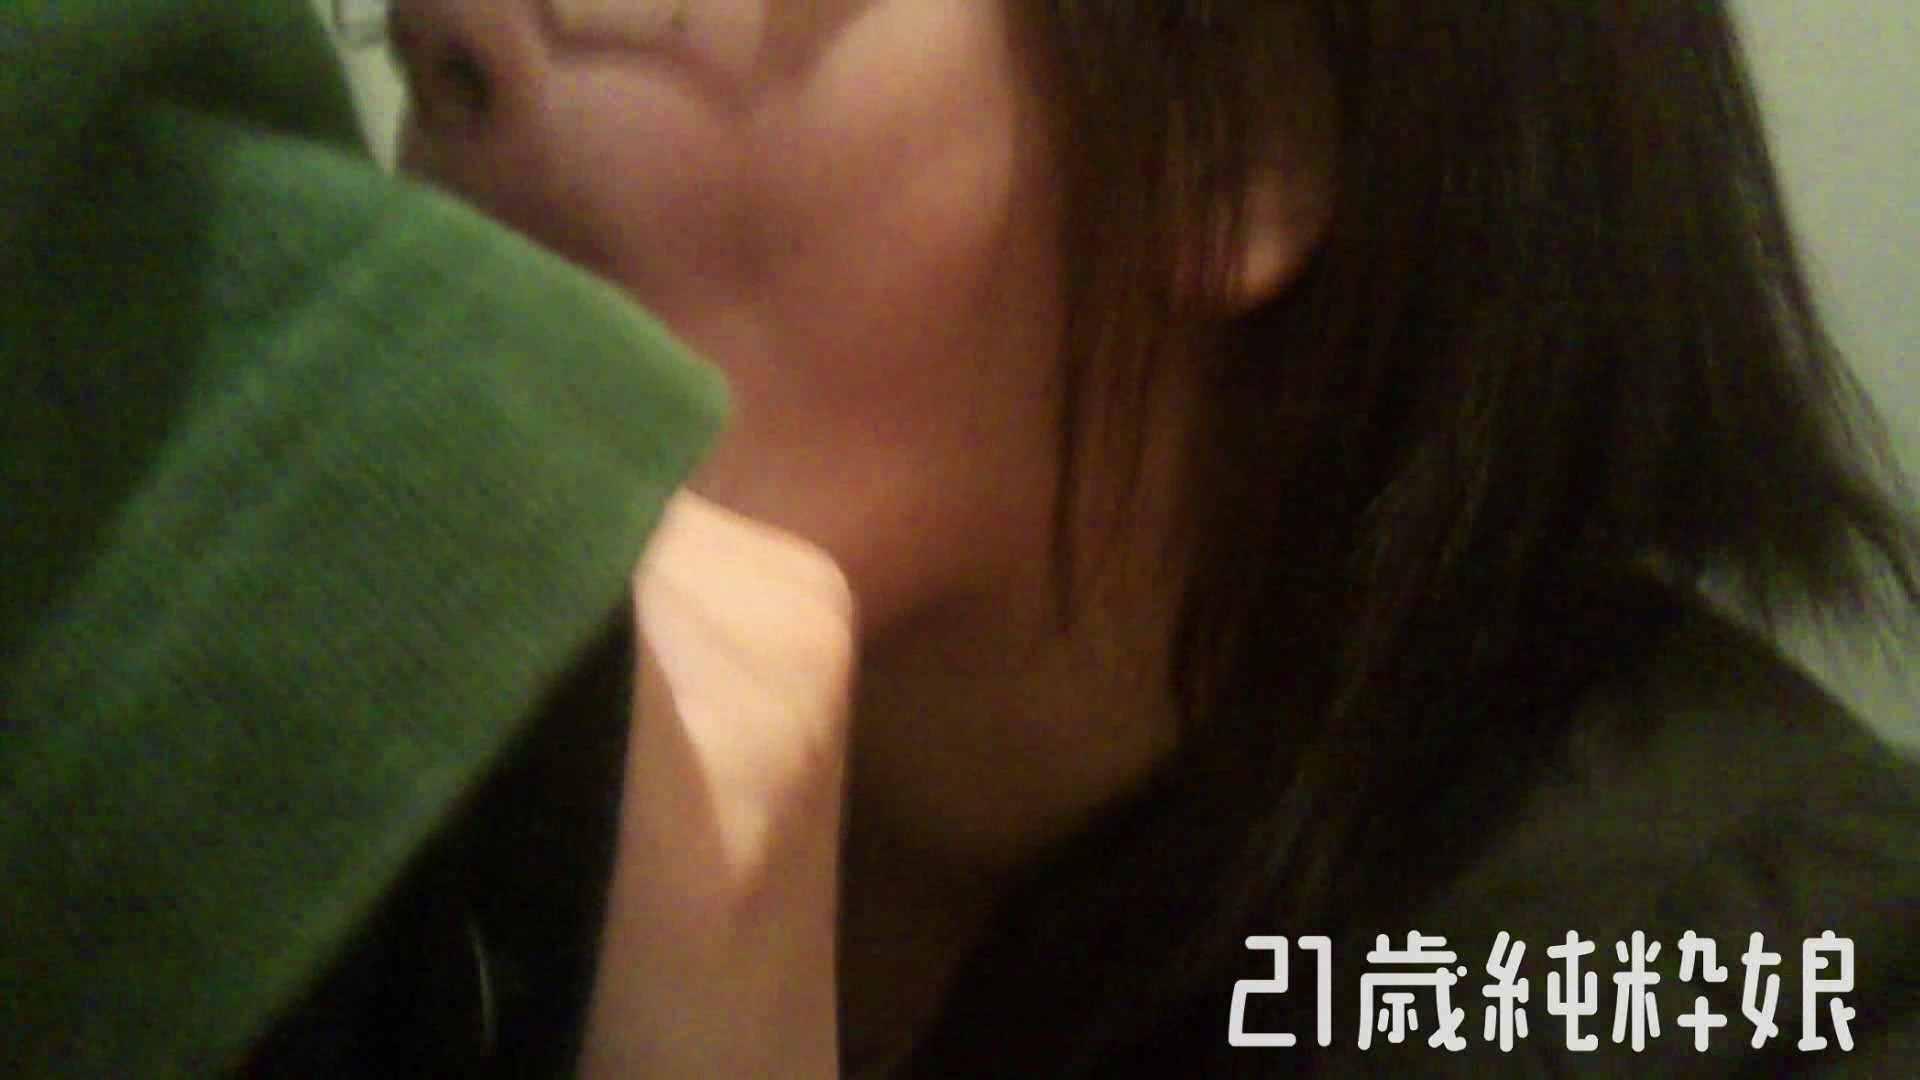 Gカップ21歳純粋嬢第2弾Vol.5 美女OL  78連発 32